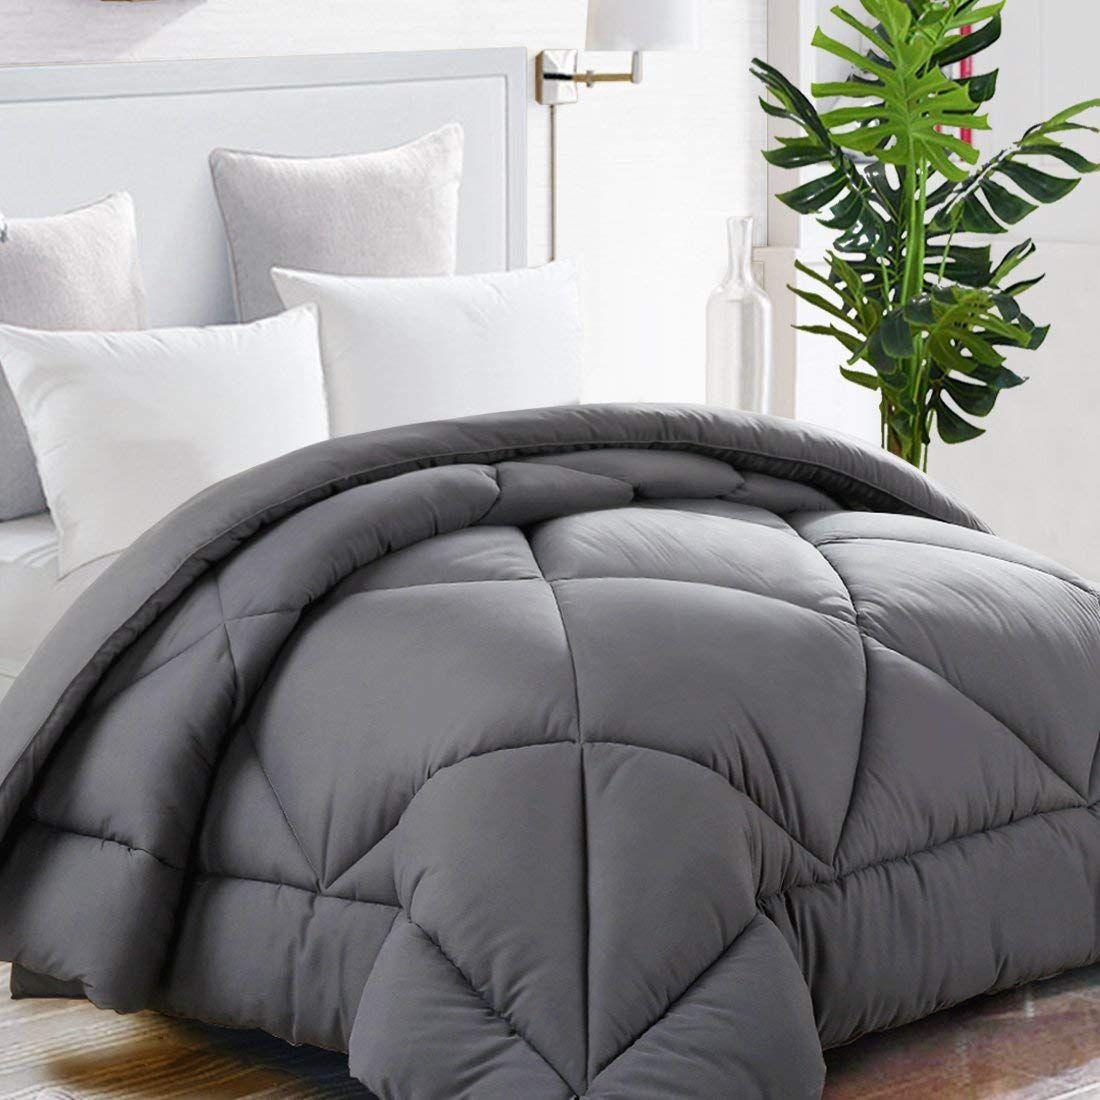 Mohap Comforter Twin Gray Ultra Warm Fluffy Down Duvet Lightweight Premium Brush